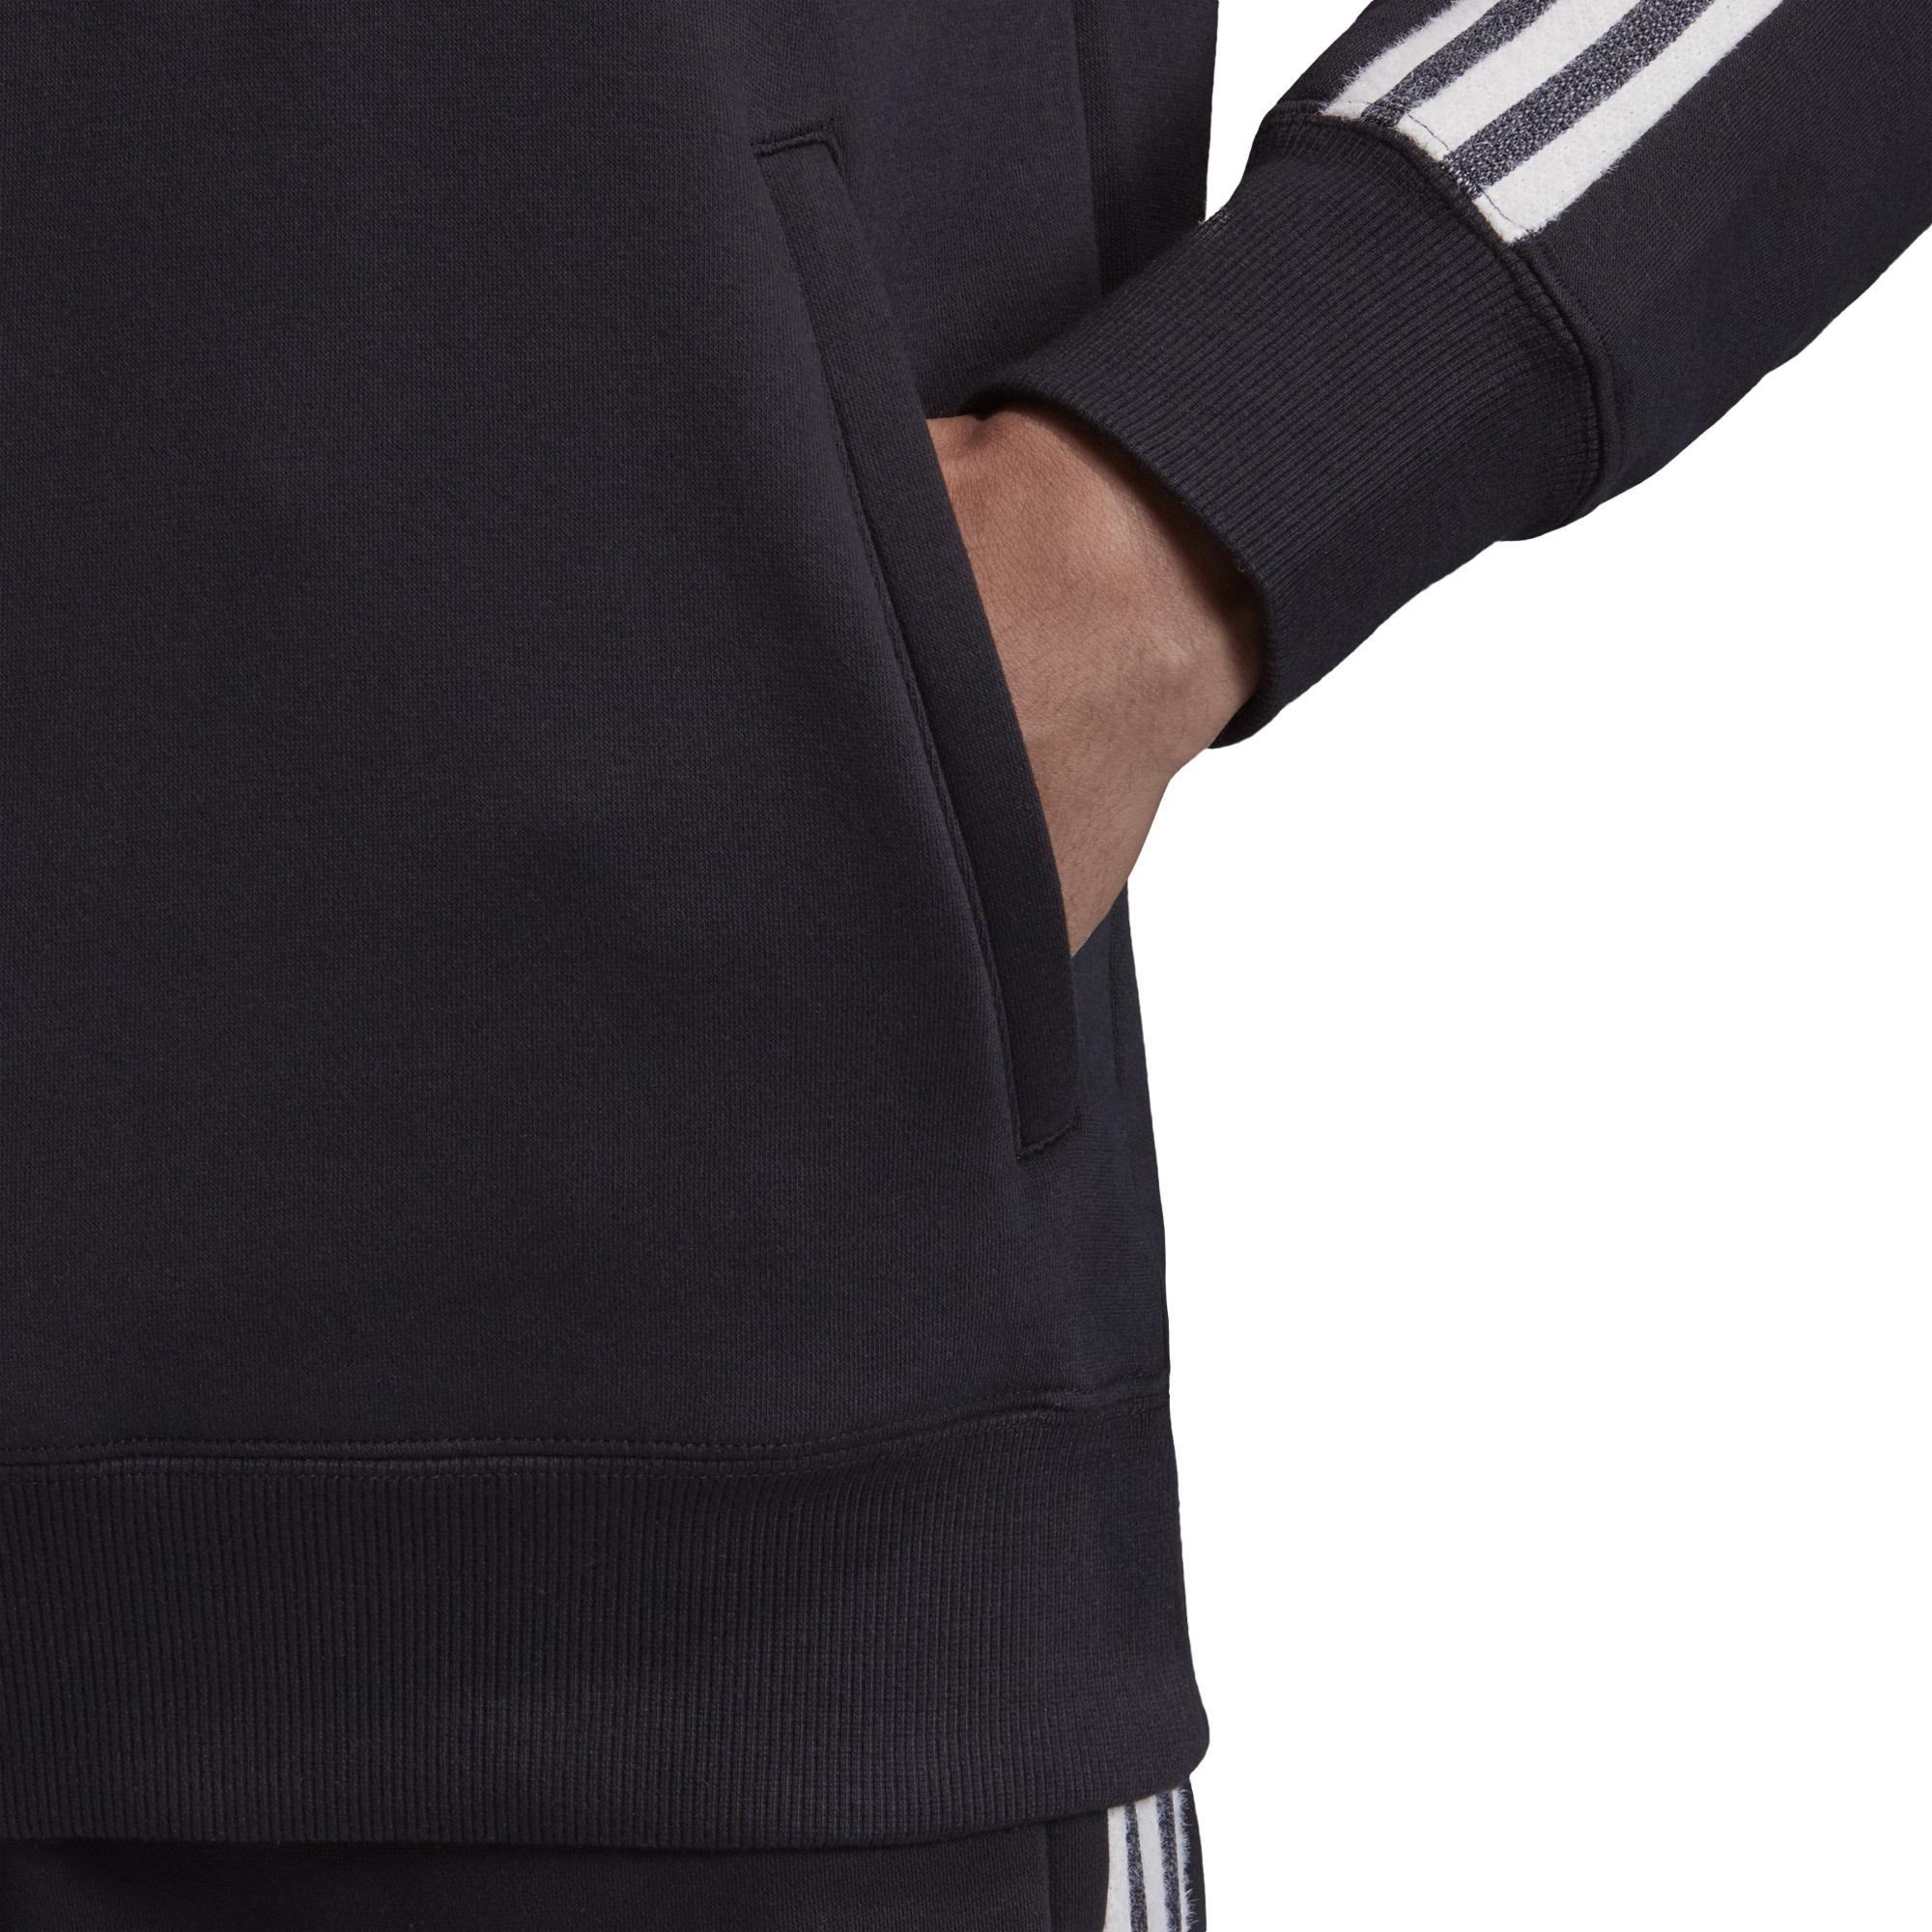 Adidas ADIDAS Juventus Icons Top